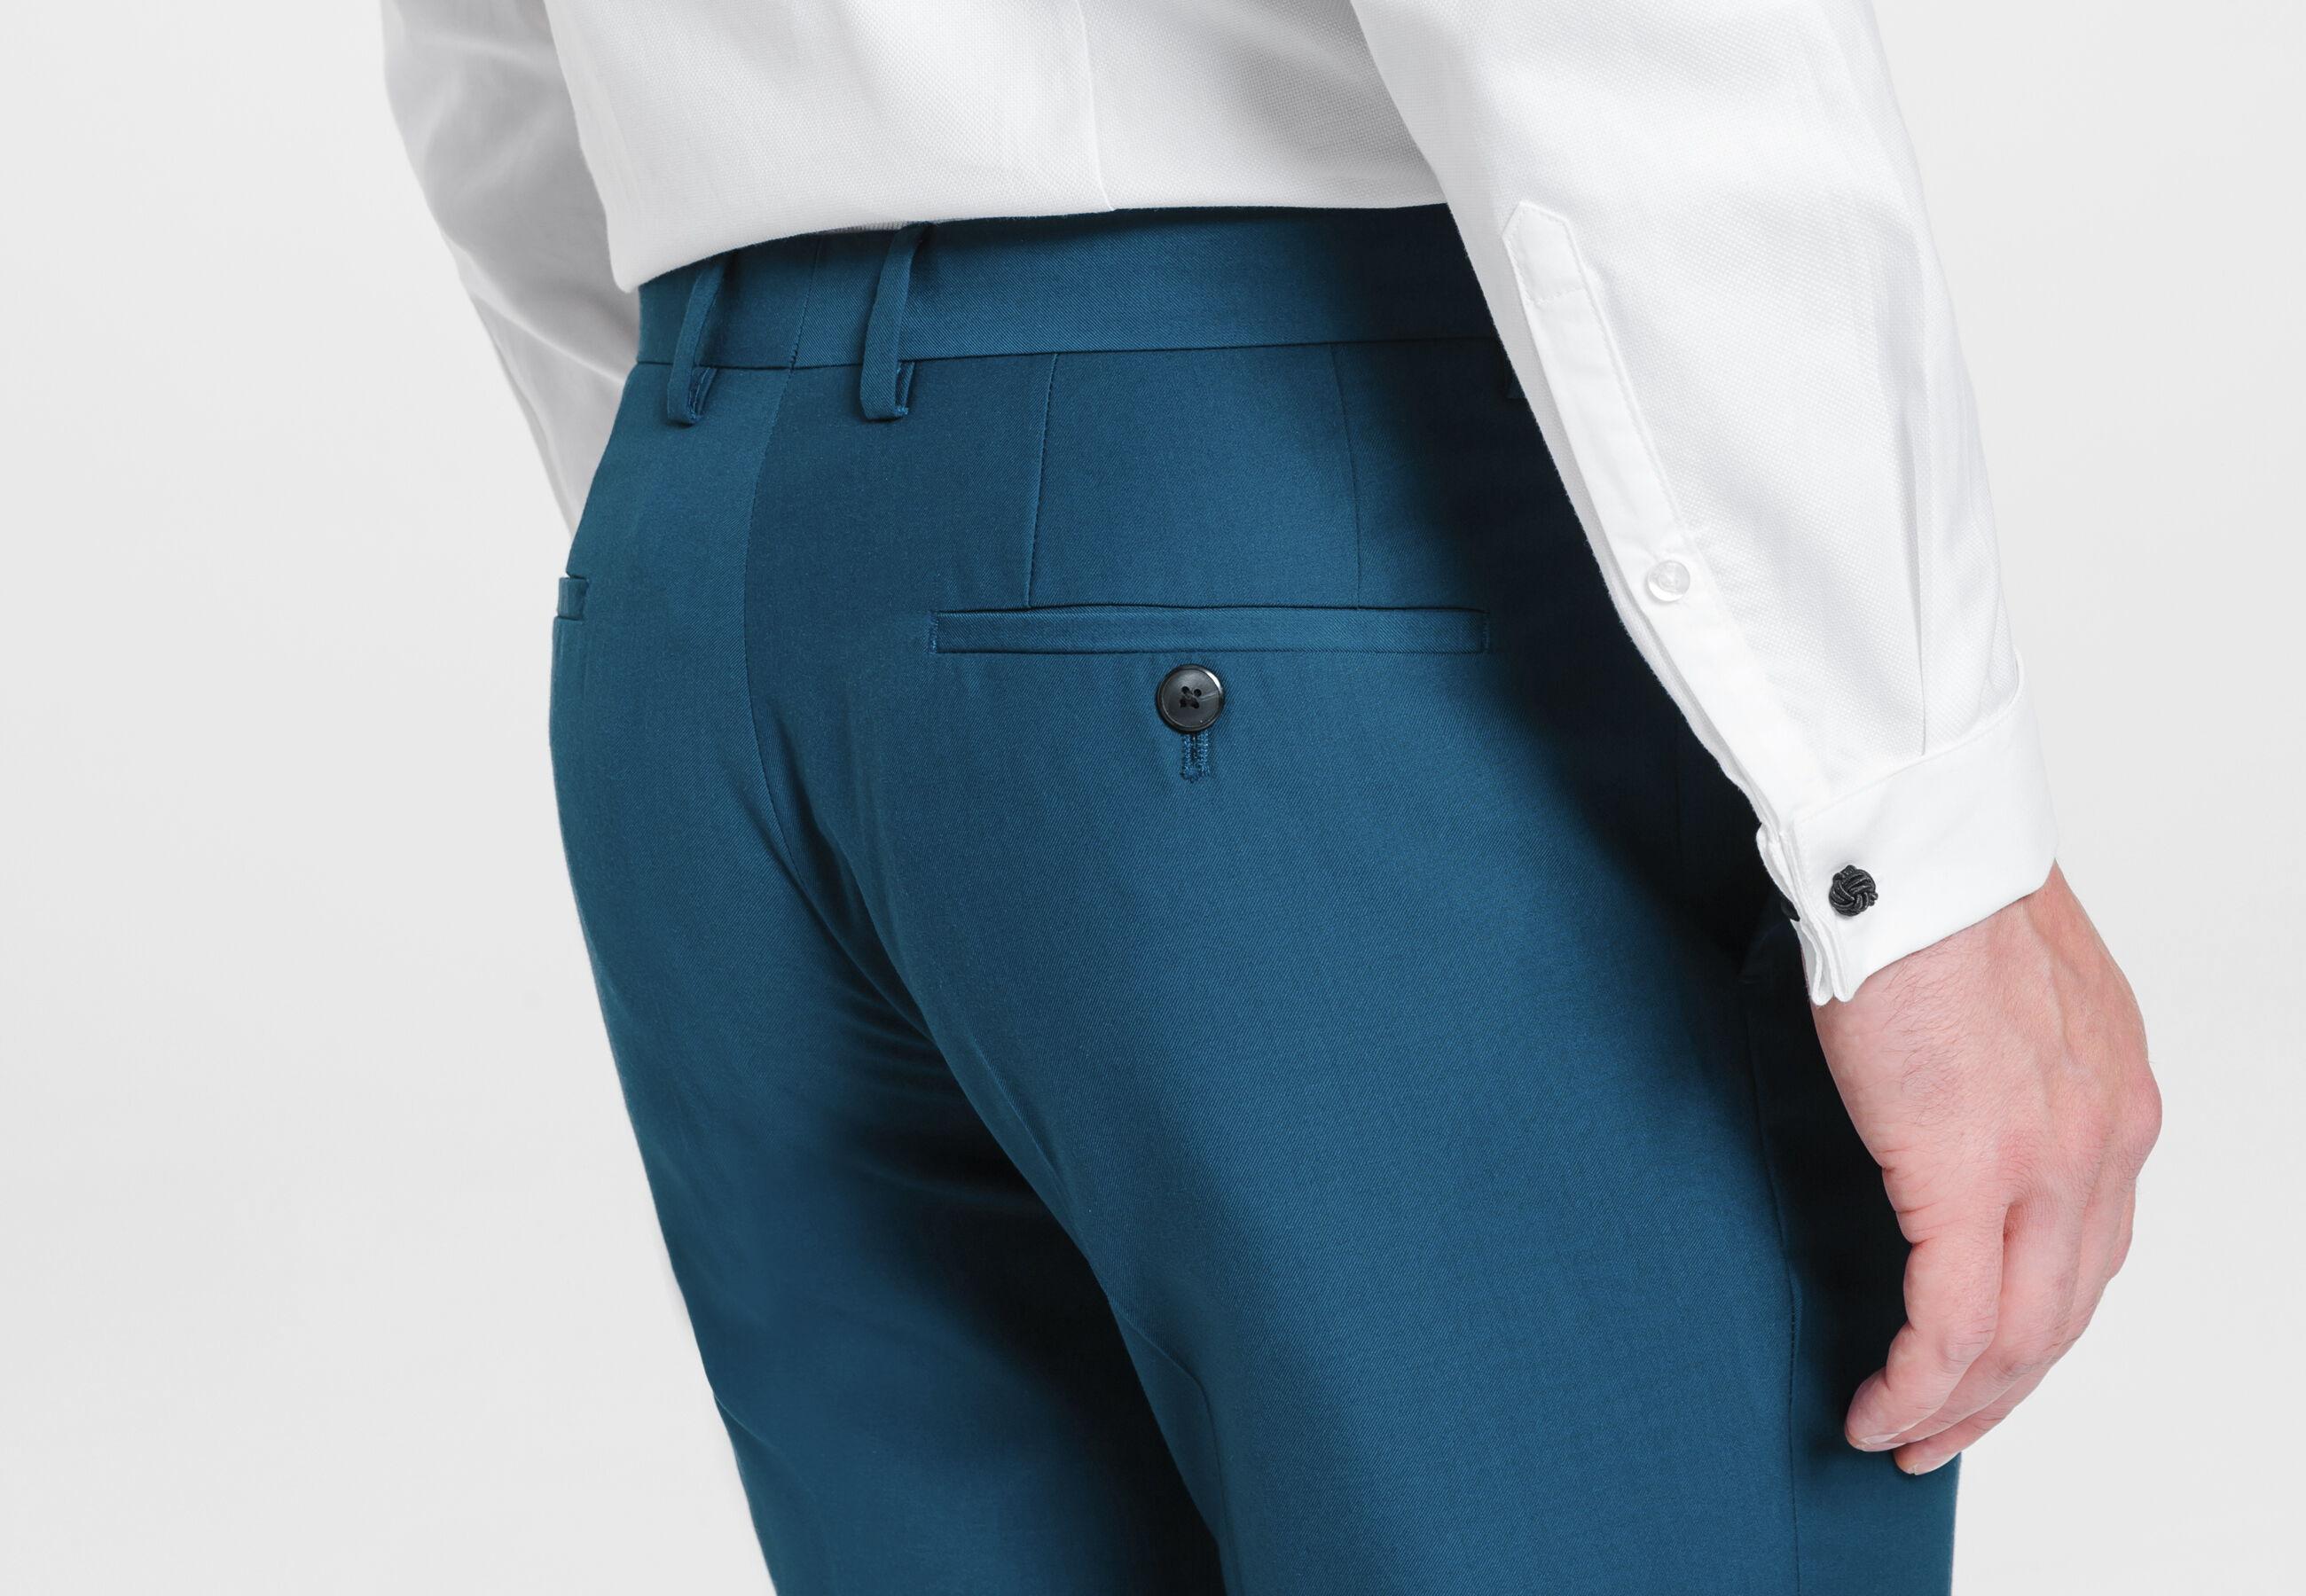 pantalon de costume slim bleu canard bleu canard homme jules. Black Bedroom Furniture Sets. Home Design Ideas